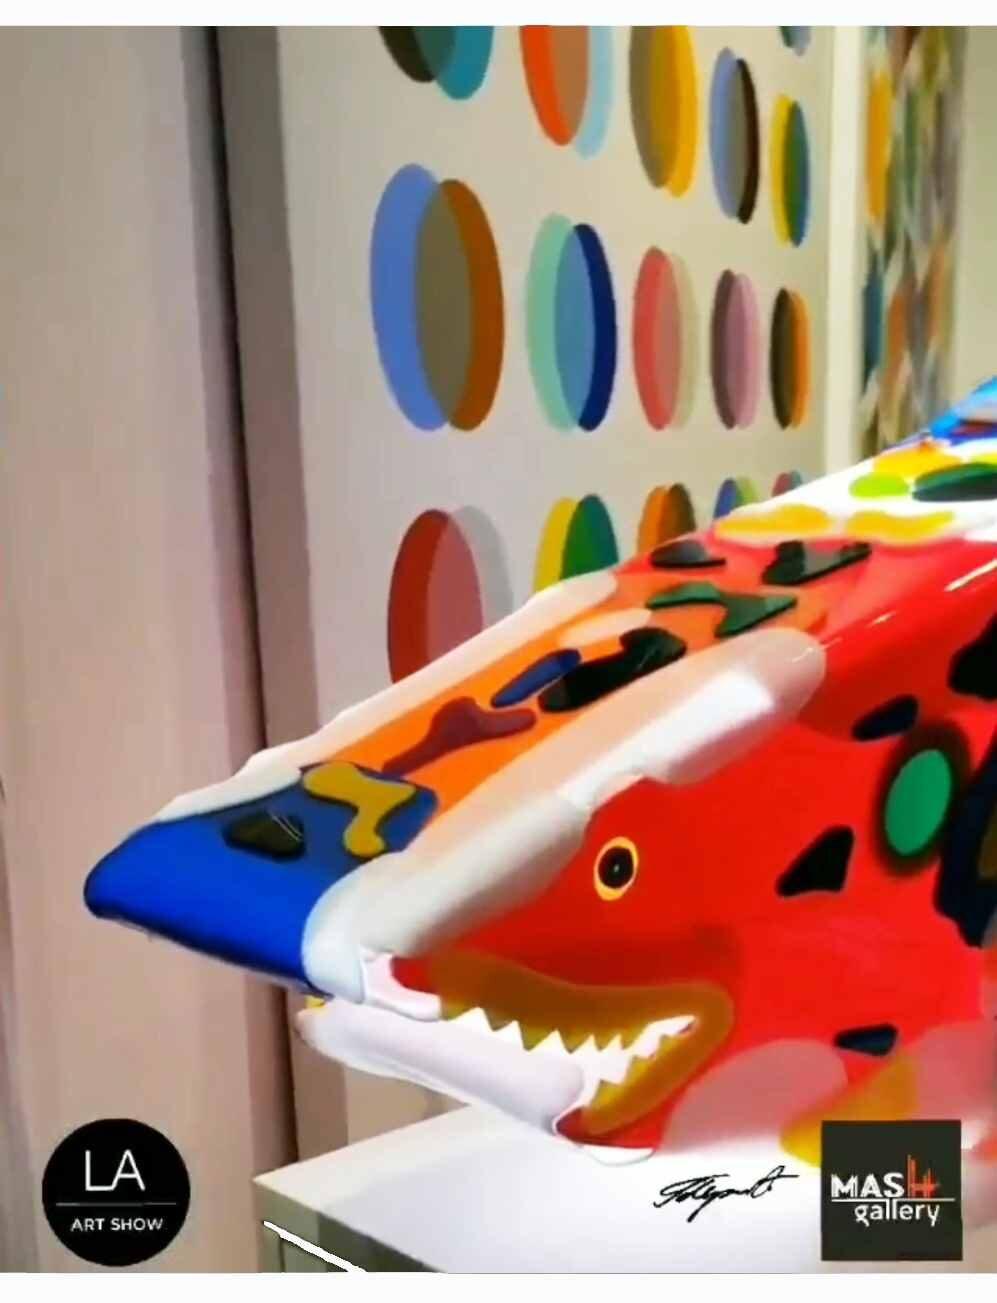 LA Art show 2021, Mash Gallery booth